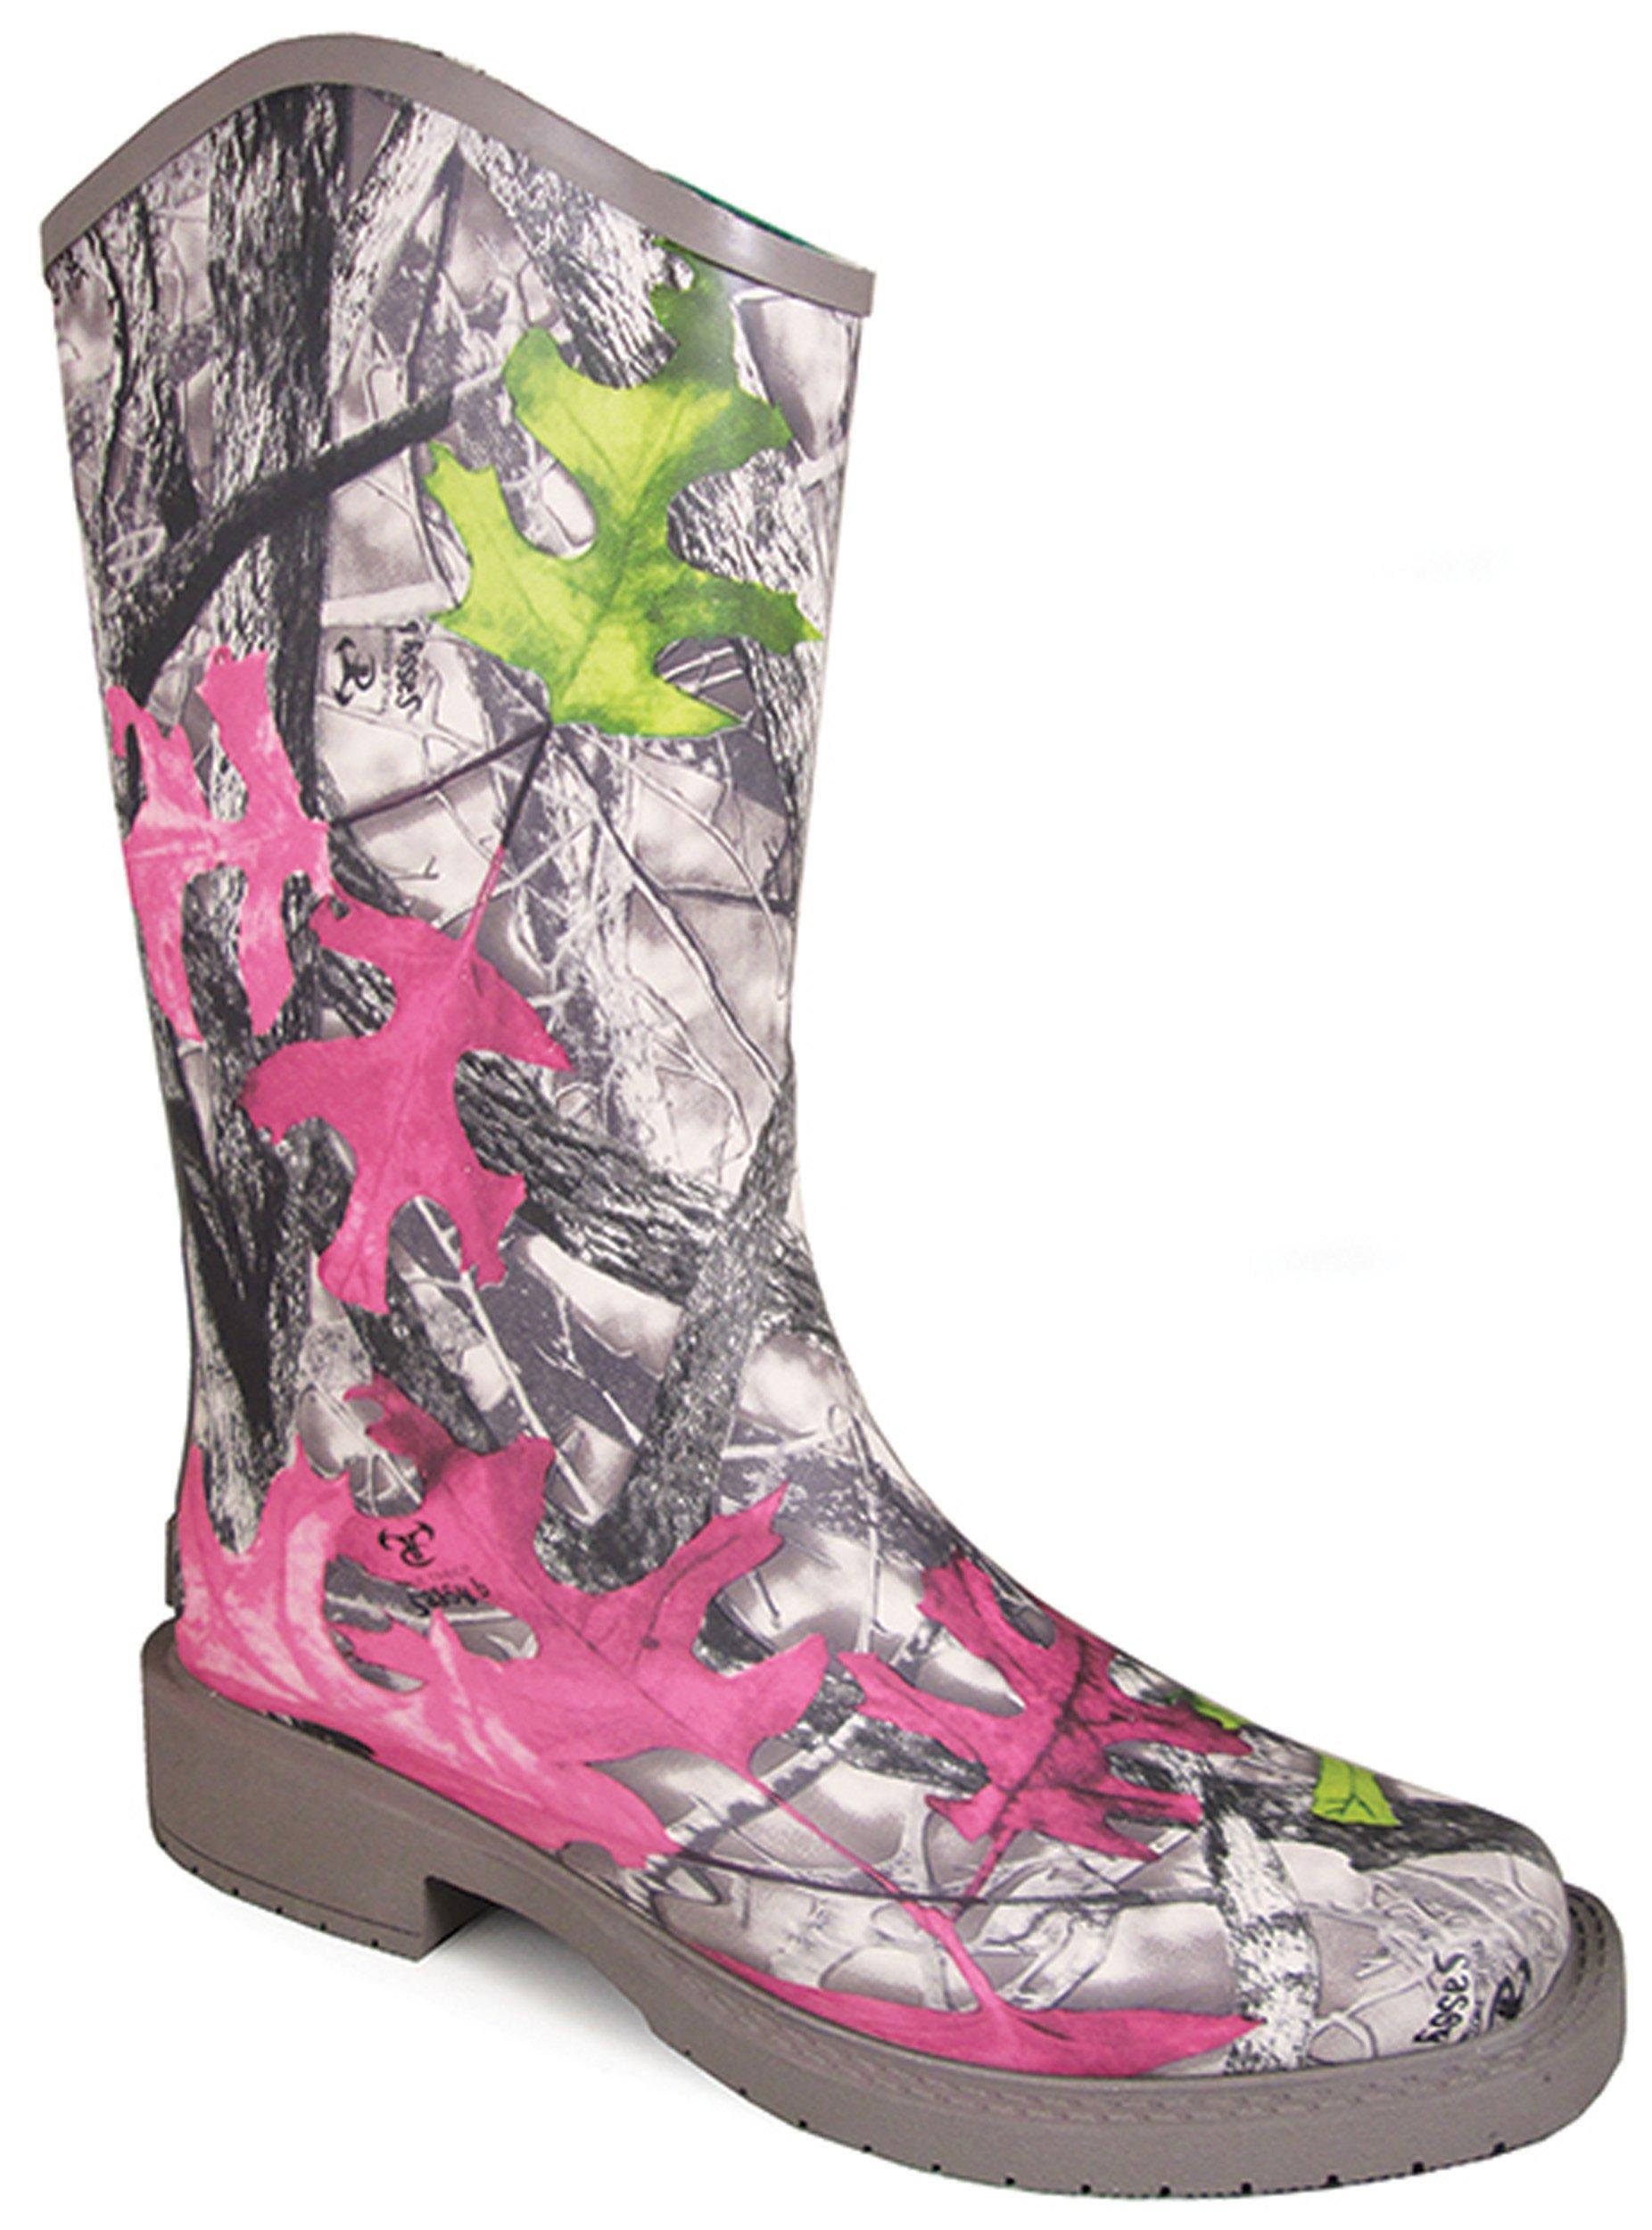 Smoky Mountain Women's Oconee Rain Boot Square Toe Camouflage 8 M